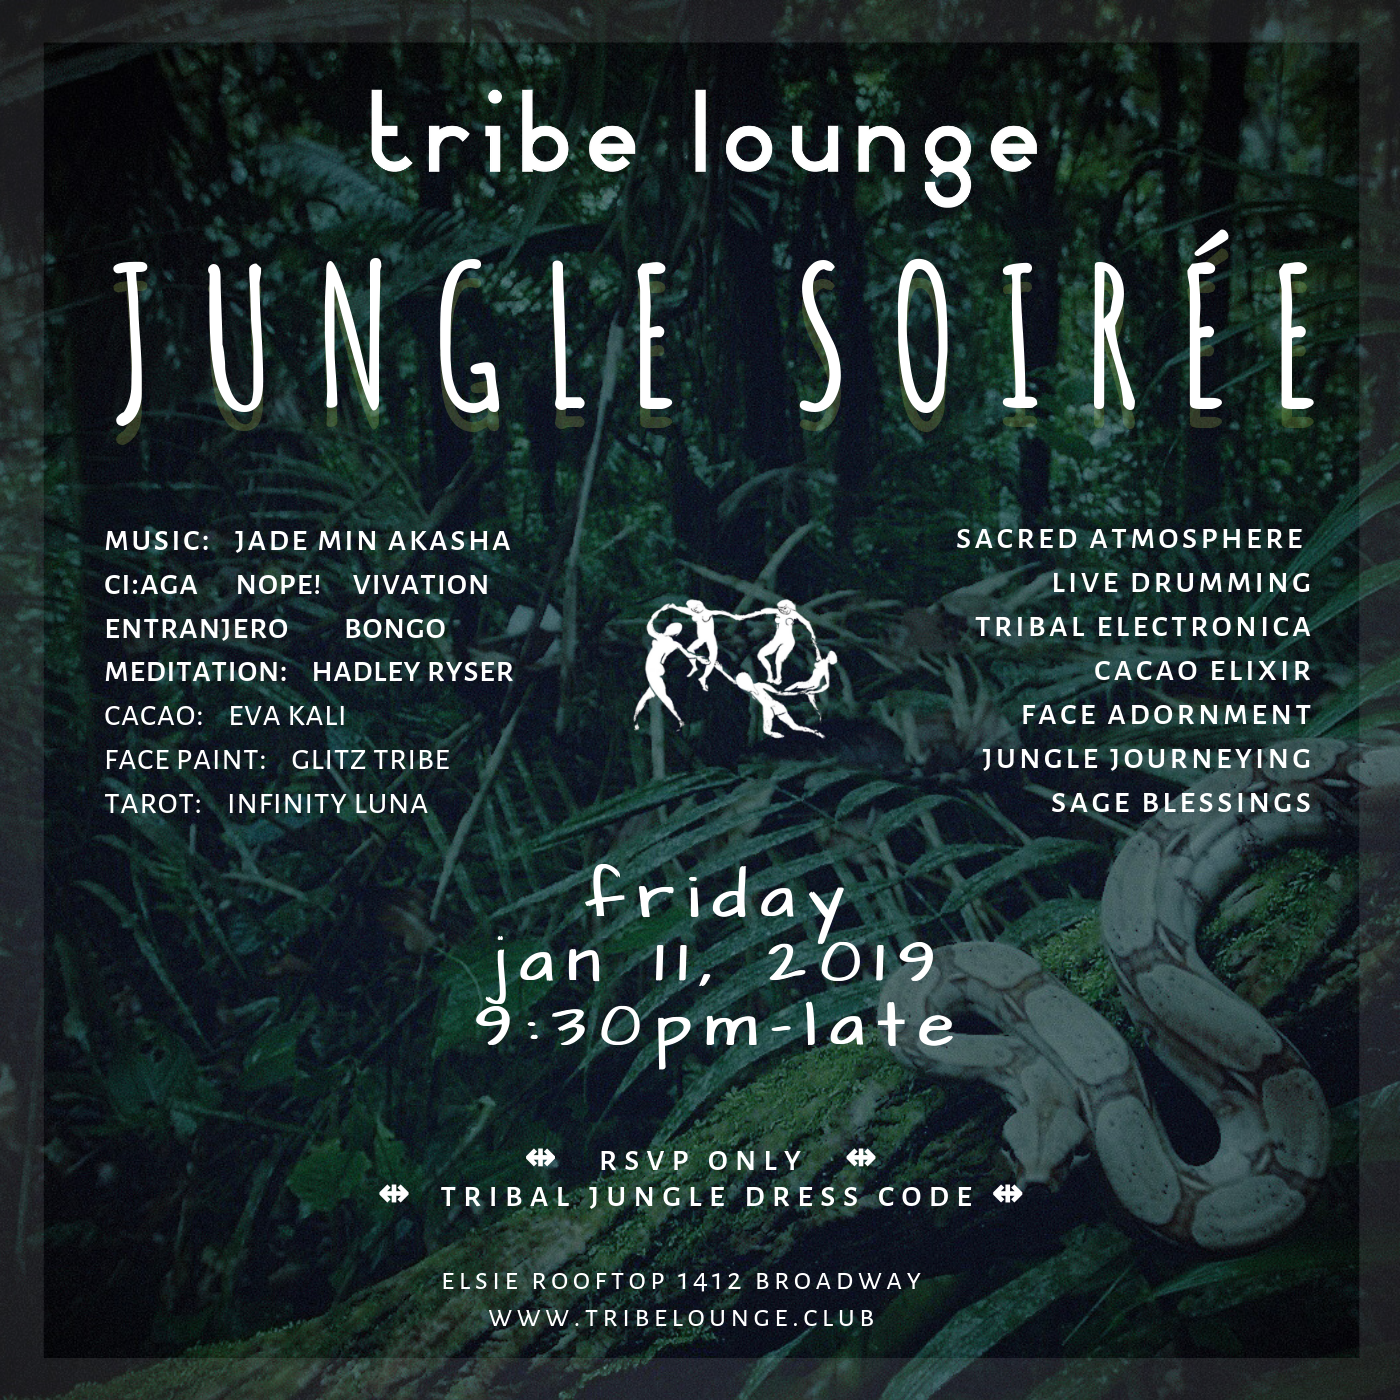 jade min akasha - winter jungle soiree.png